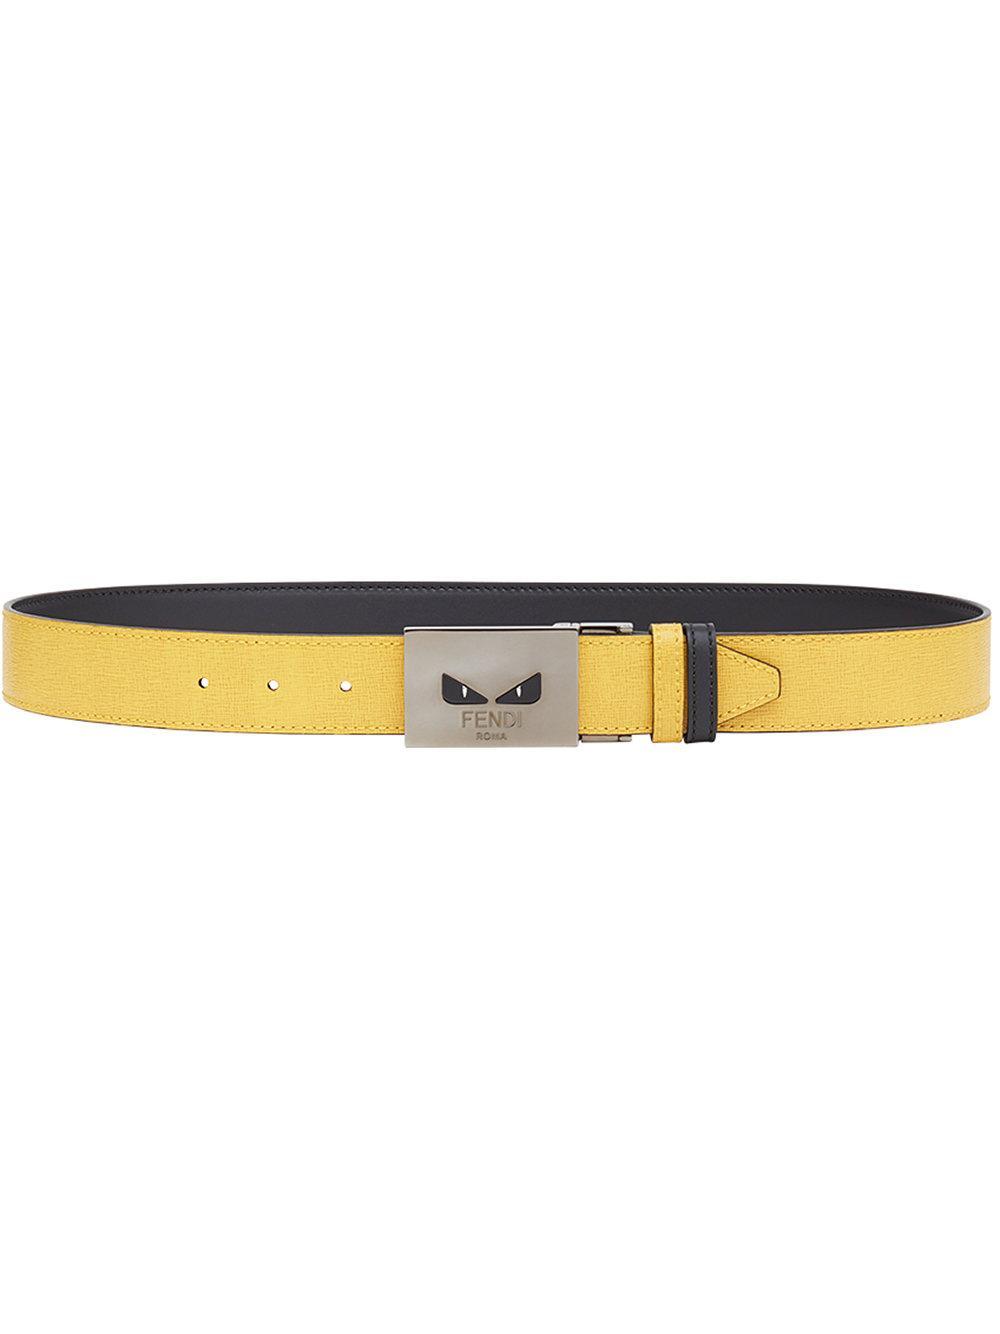 c16566bc0026 FENDI. Fendi Bag Bugs Buckled Belt - Red